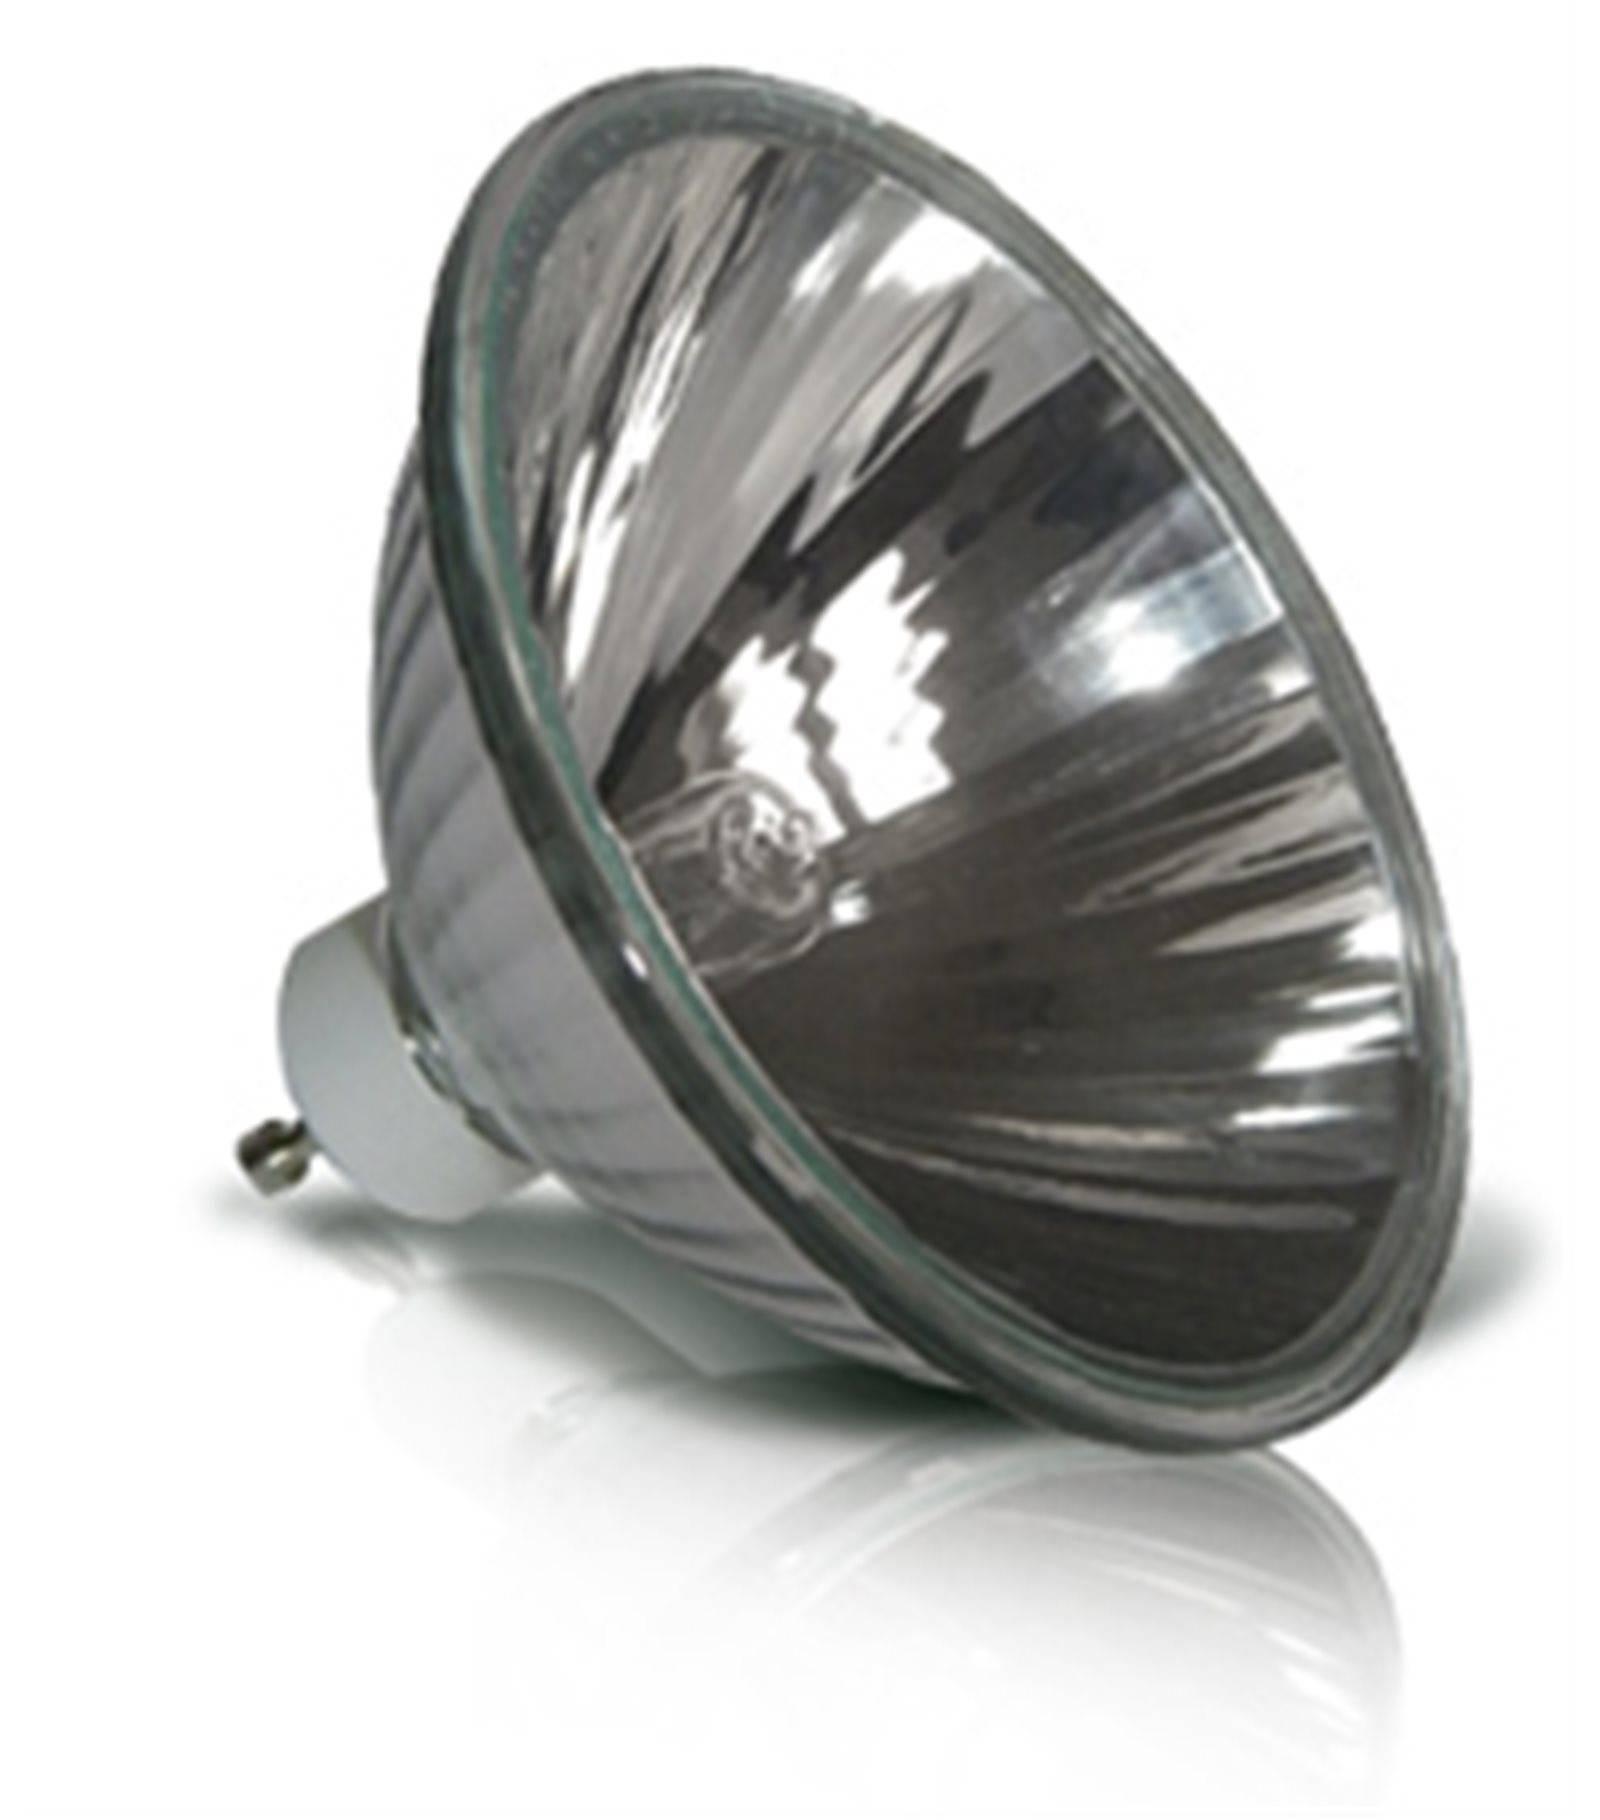 ampoule eco halog ne gu10 mr30 24w quiv 30w blanc chaud easy connect ampoule eco halogene. Black Bedroom Furniture Sets. Home Design Ideas